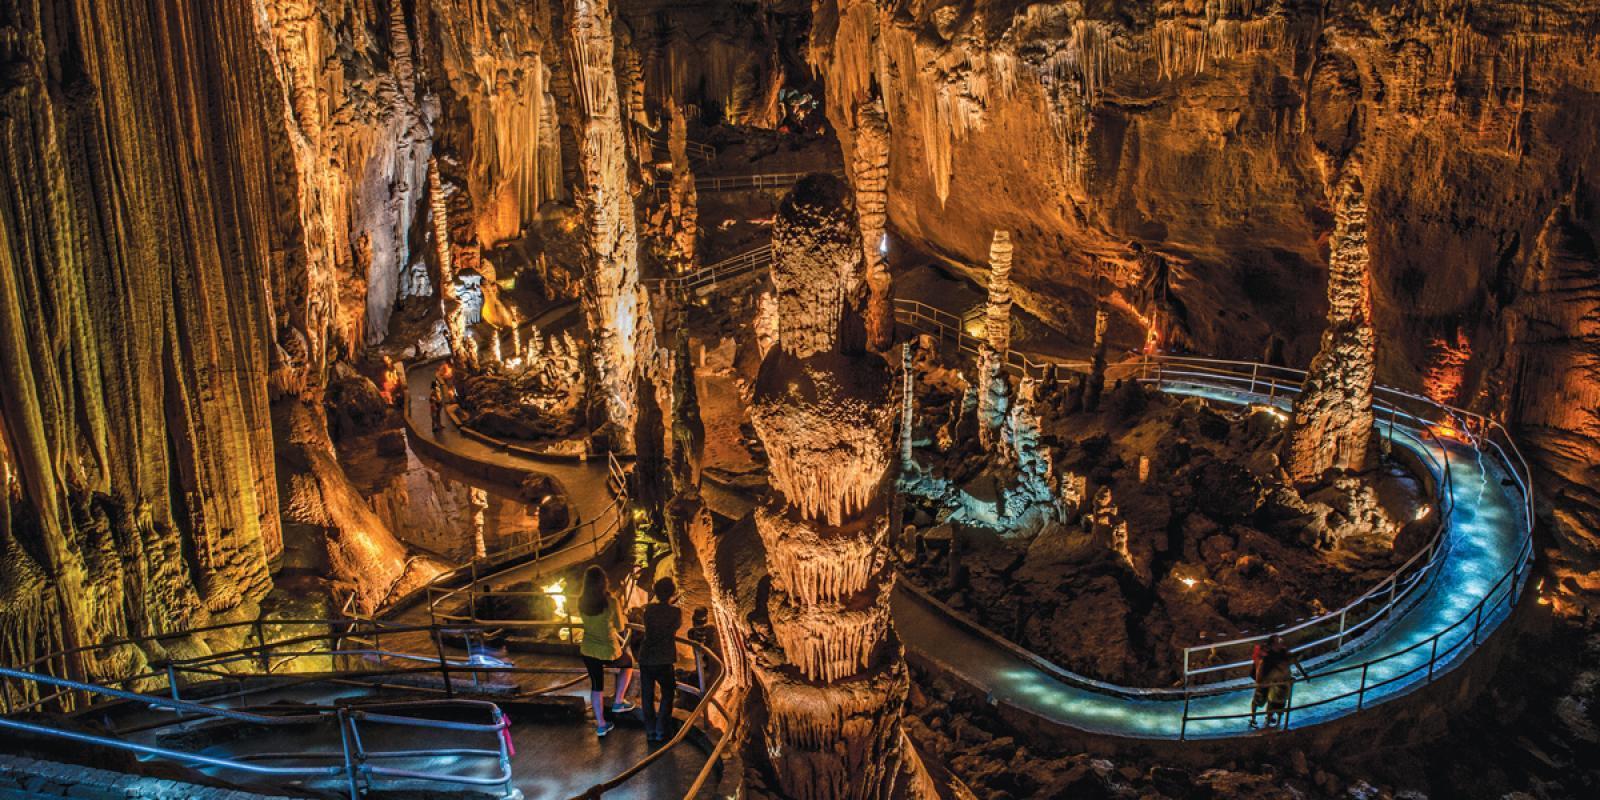 Blanchard Springs Caverns, Arkansas